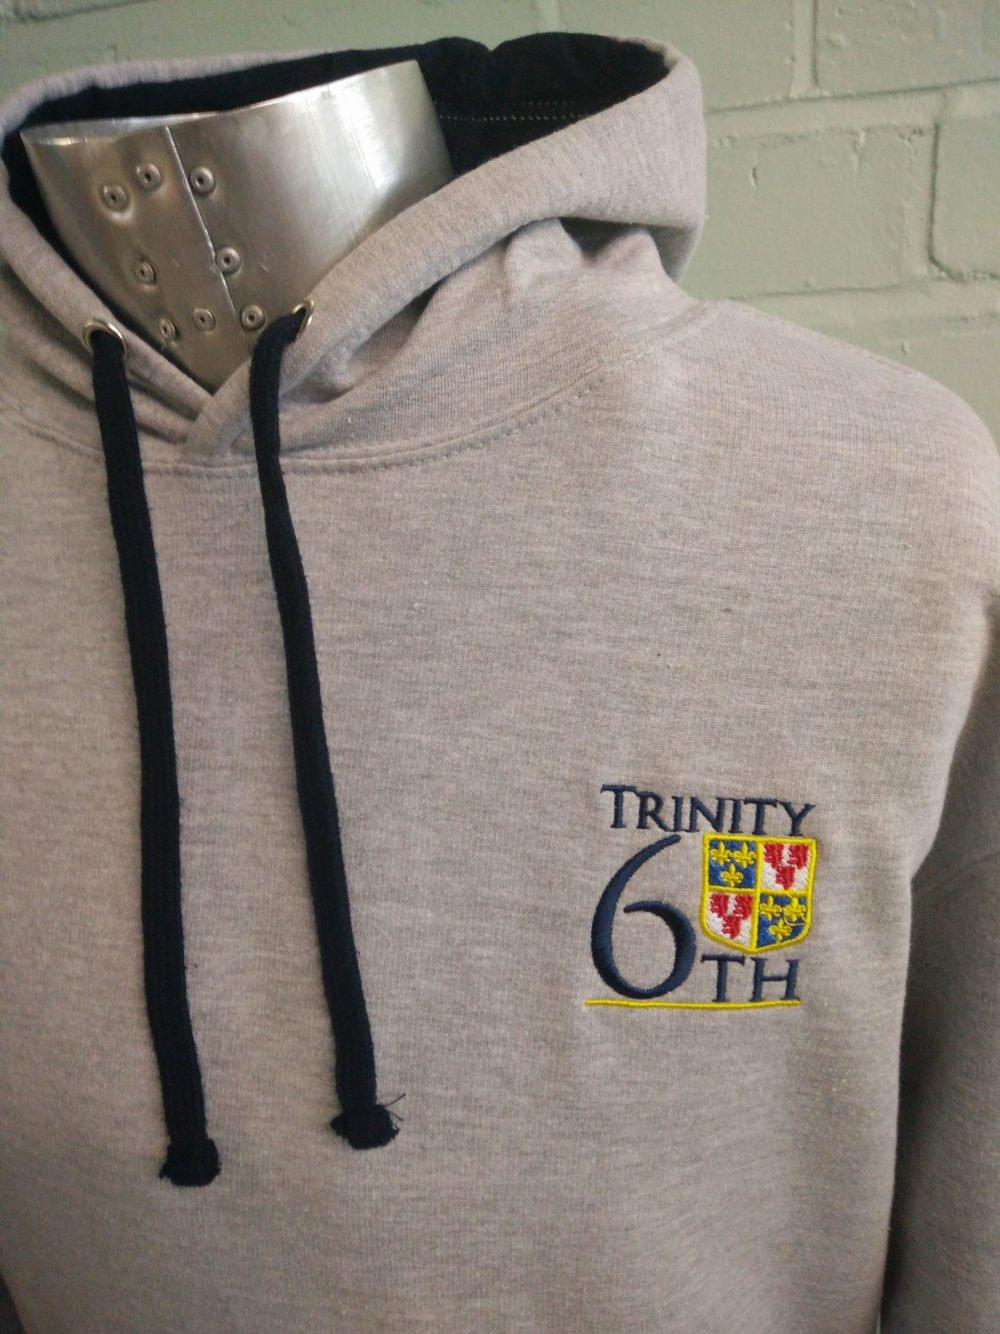 Trinity 6th Grey Leavers Hoodies 2017